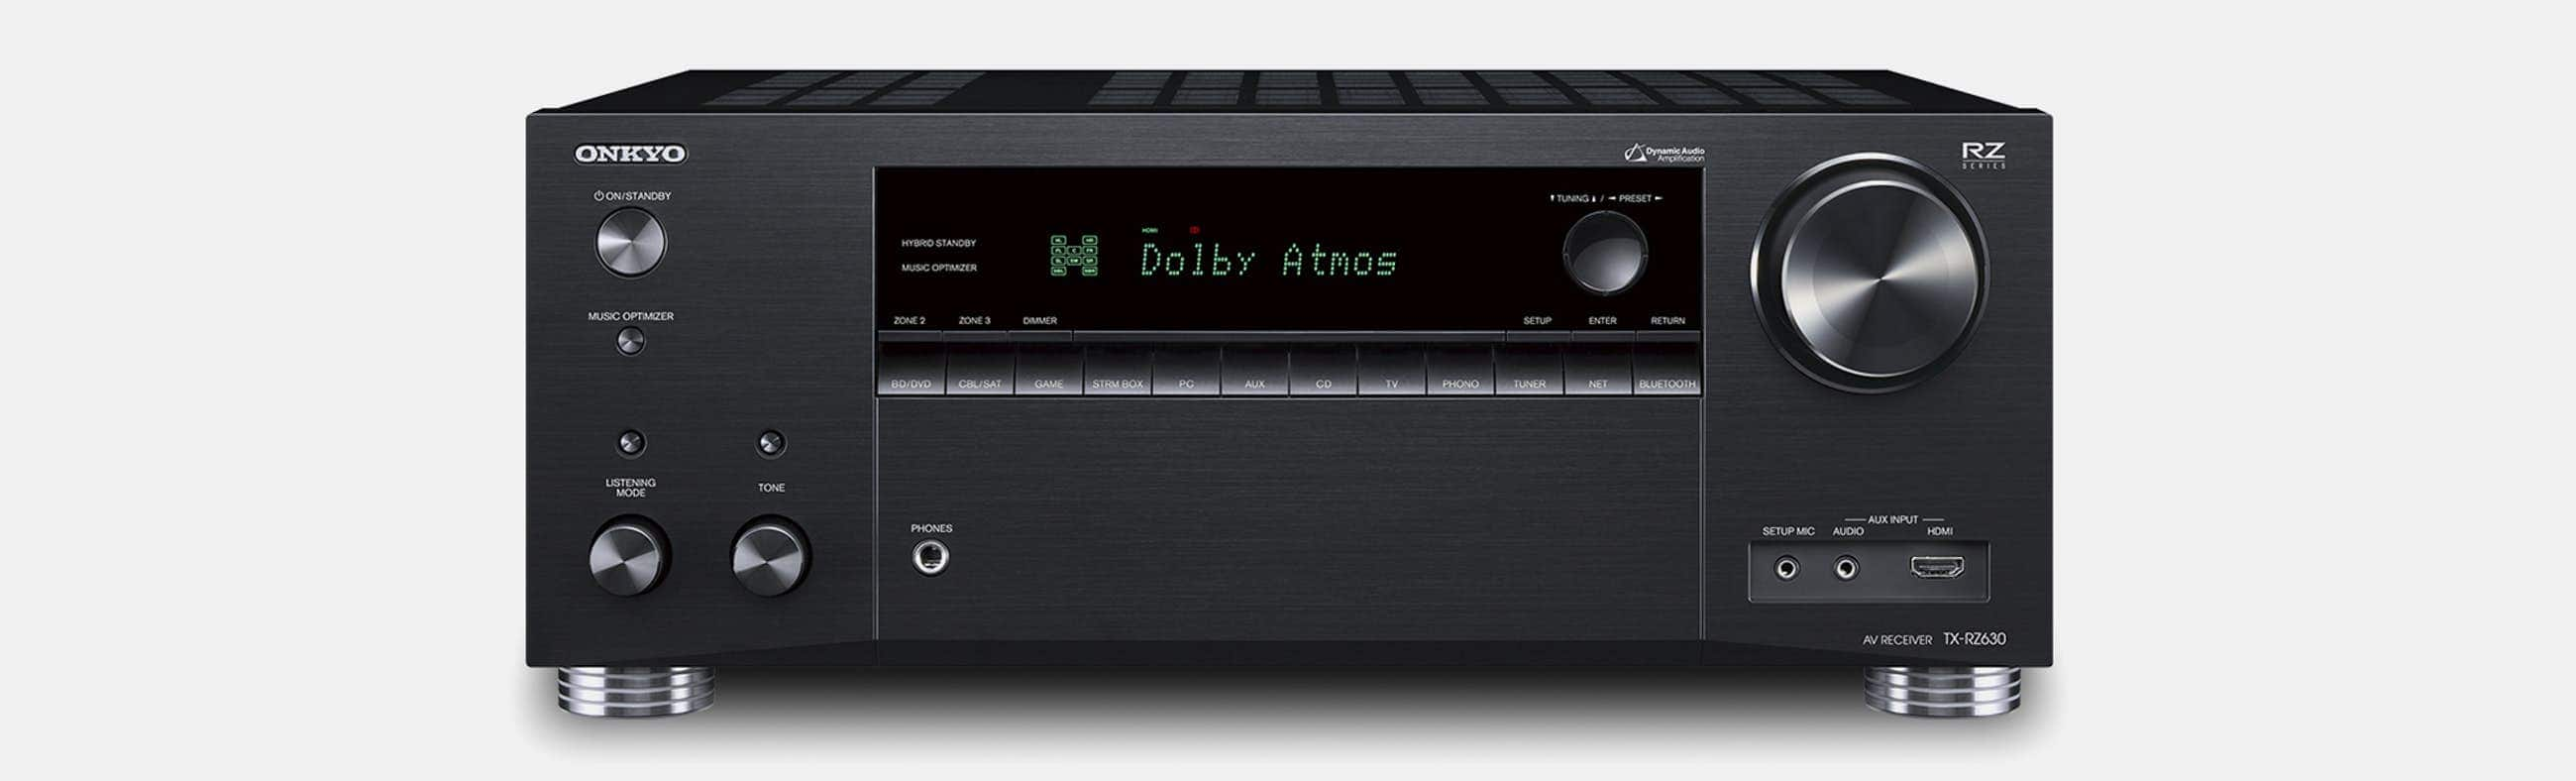 Onkyo TX-RZ630 9.2-ch receiver $599 AC